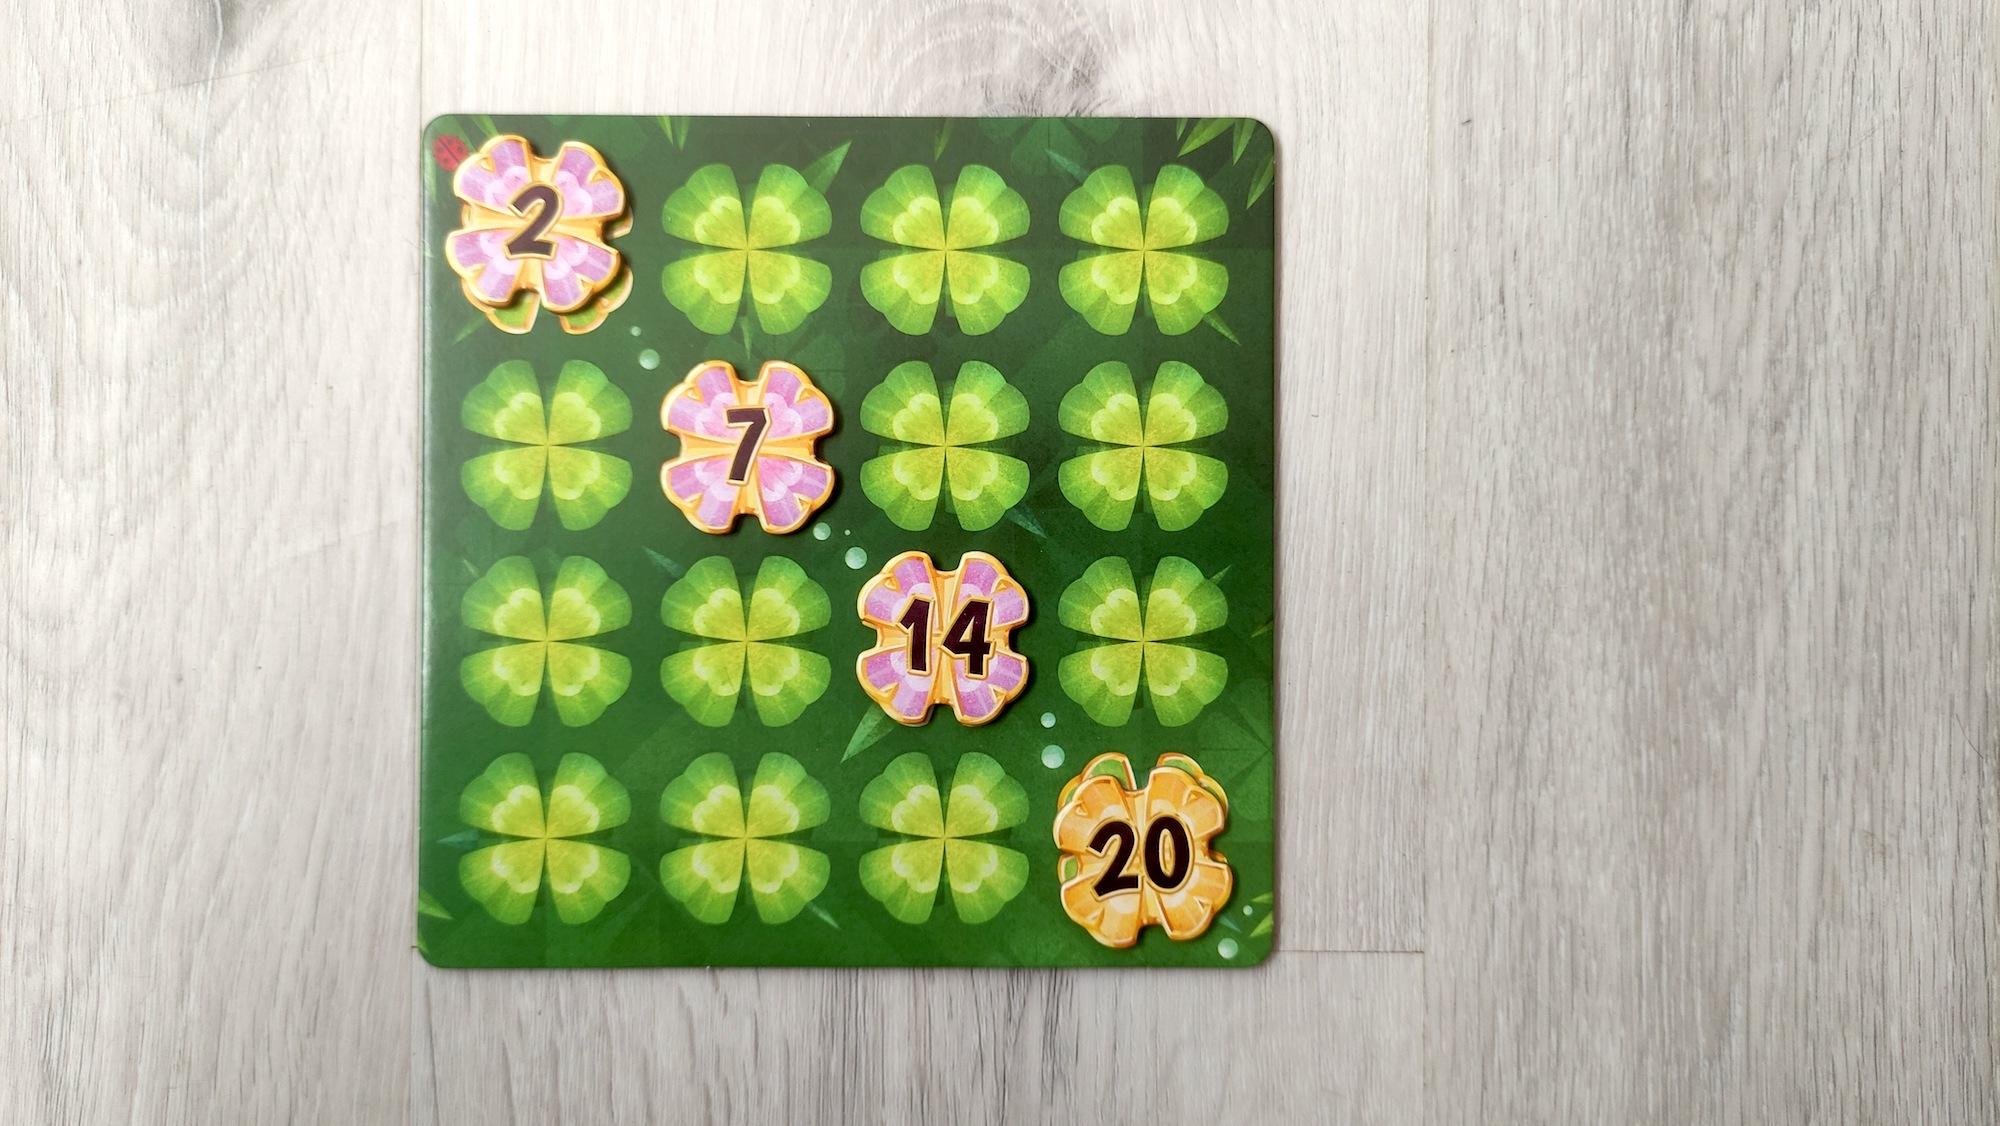 lucky-numbers-jeu-avis-test-10